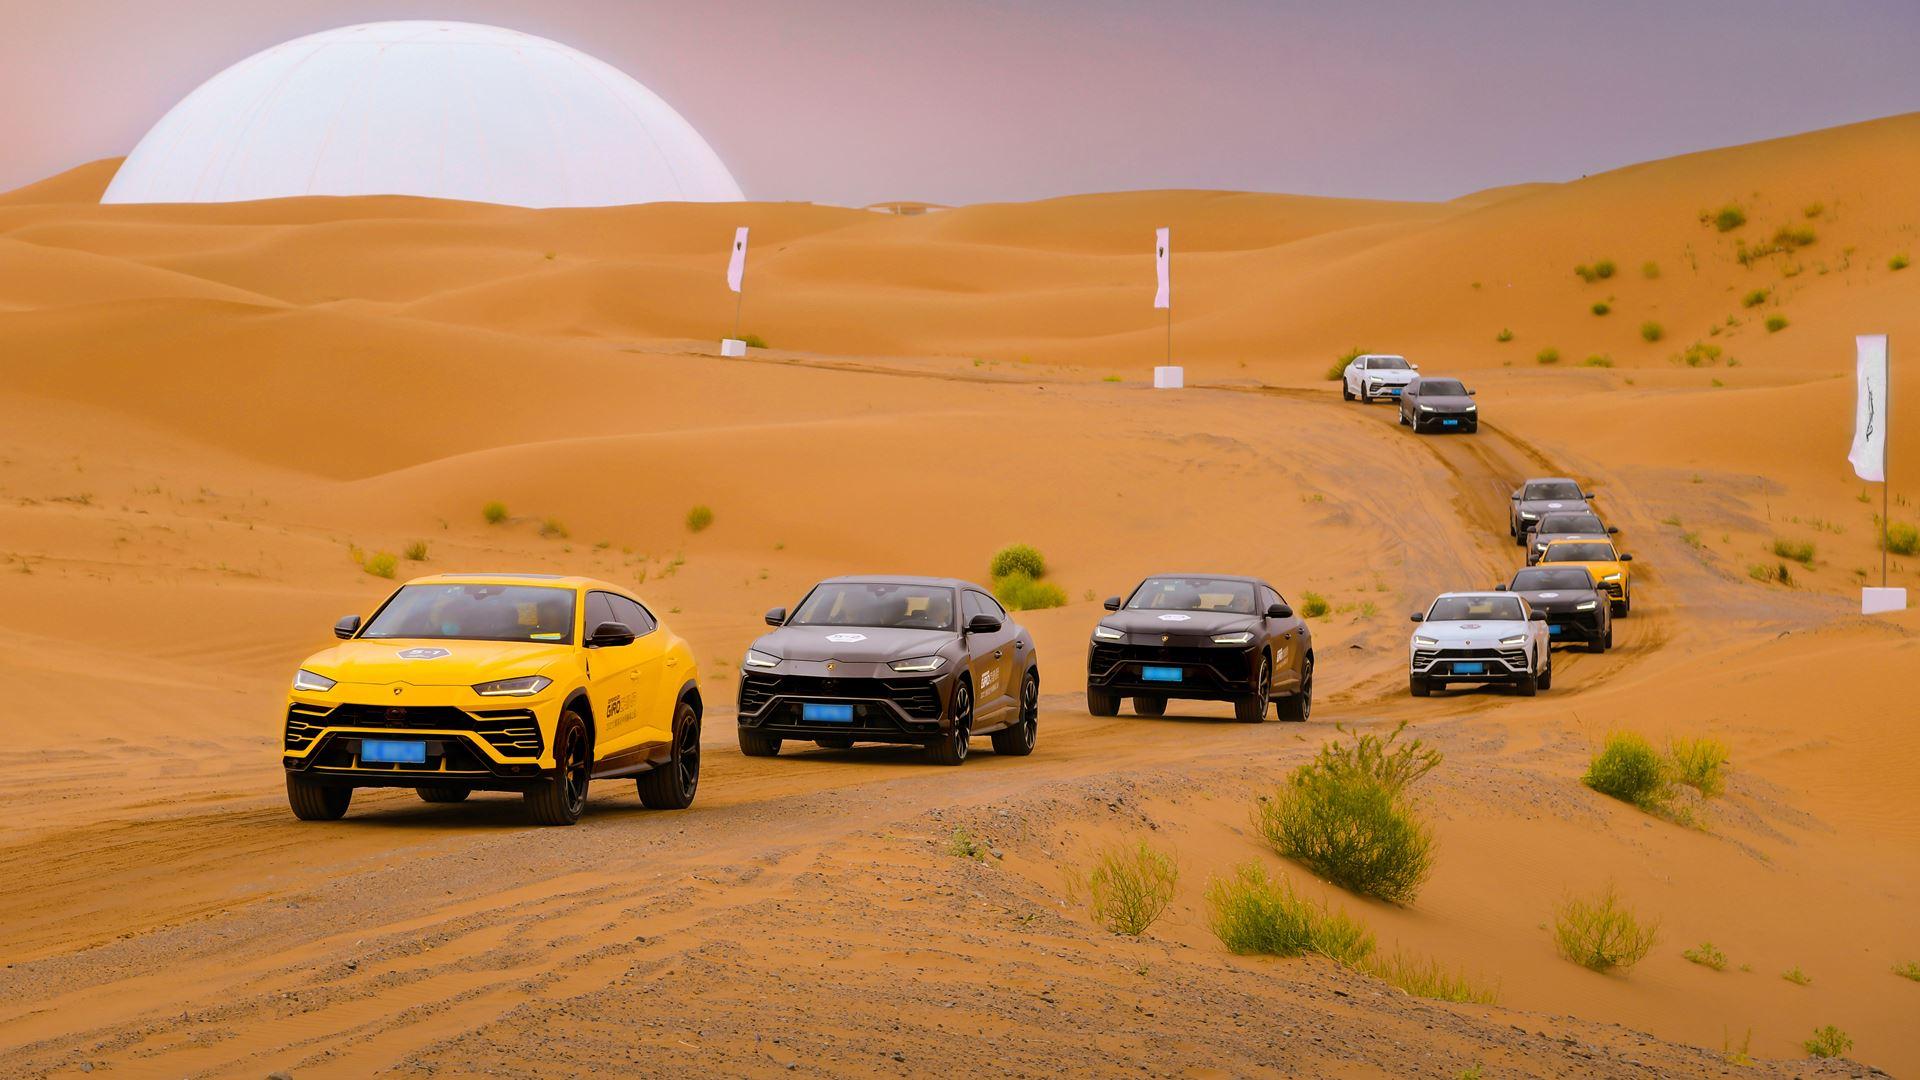 "Lamborghini Esperienza Giro ""Journey into the Vast"" Unparalleled expedition of 42 Lamborghinis through the North West of China - Image 5"